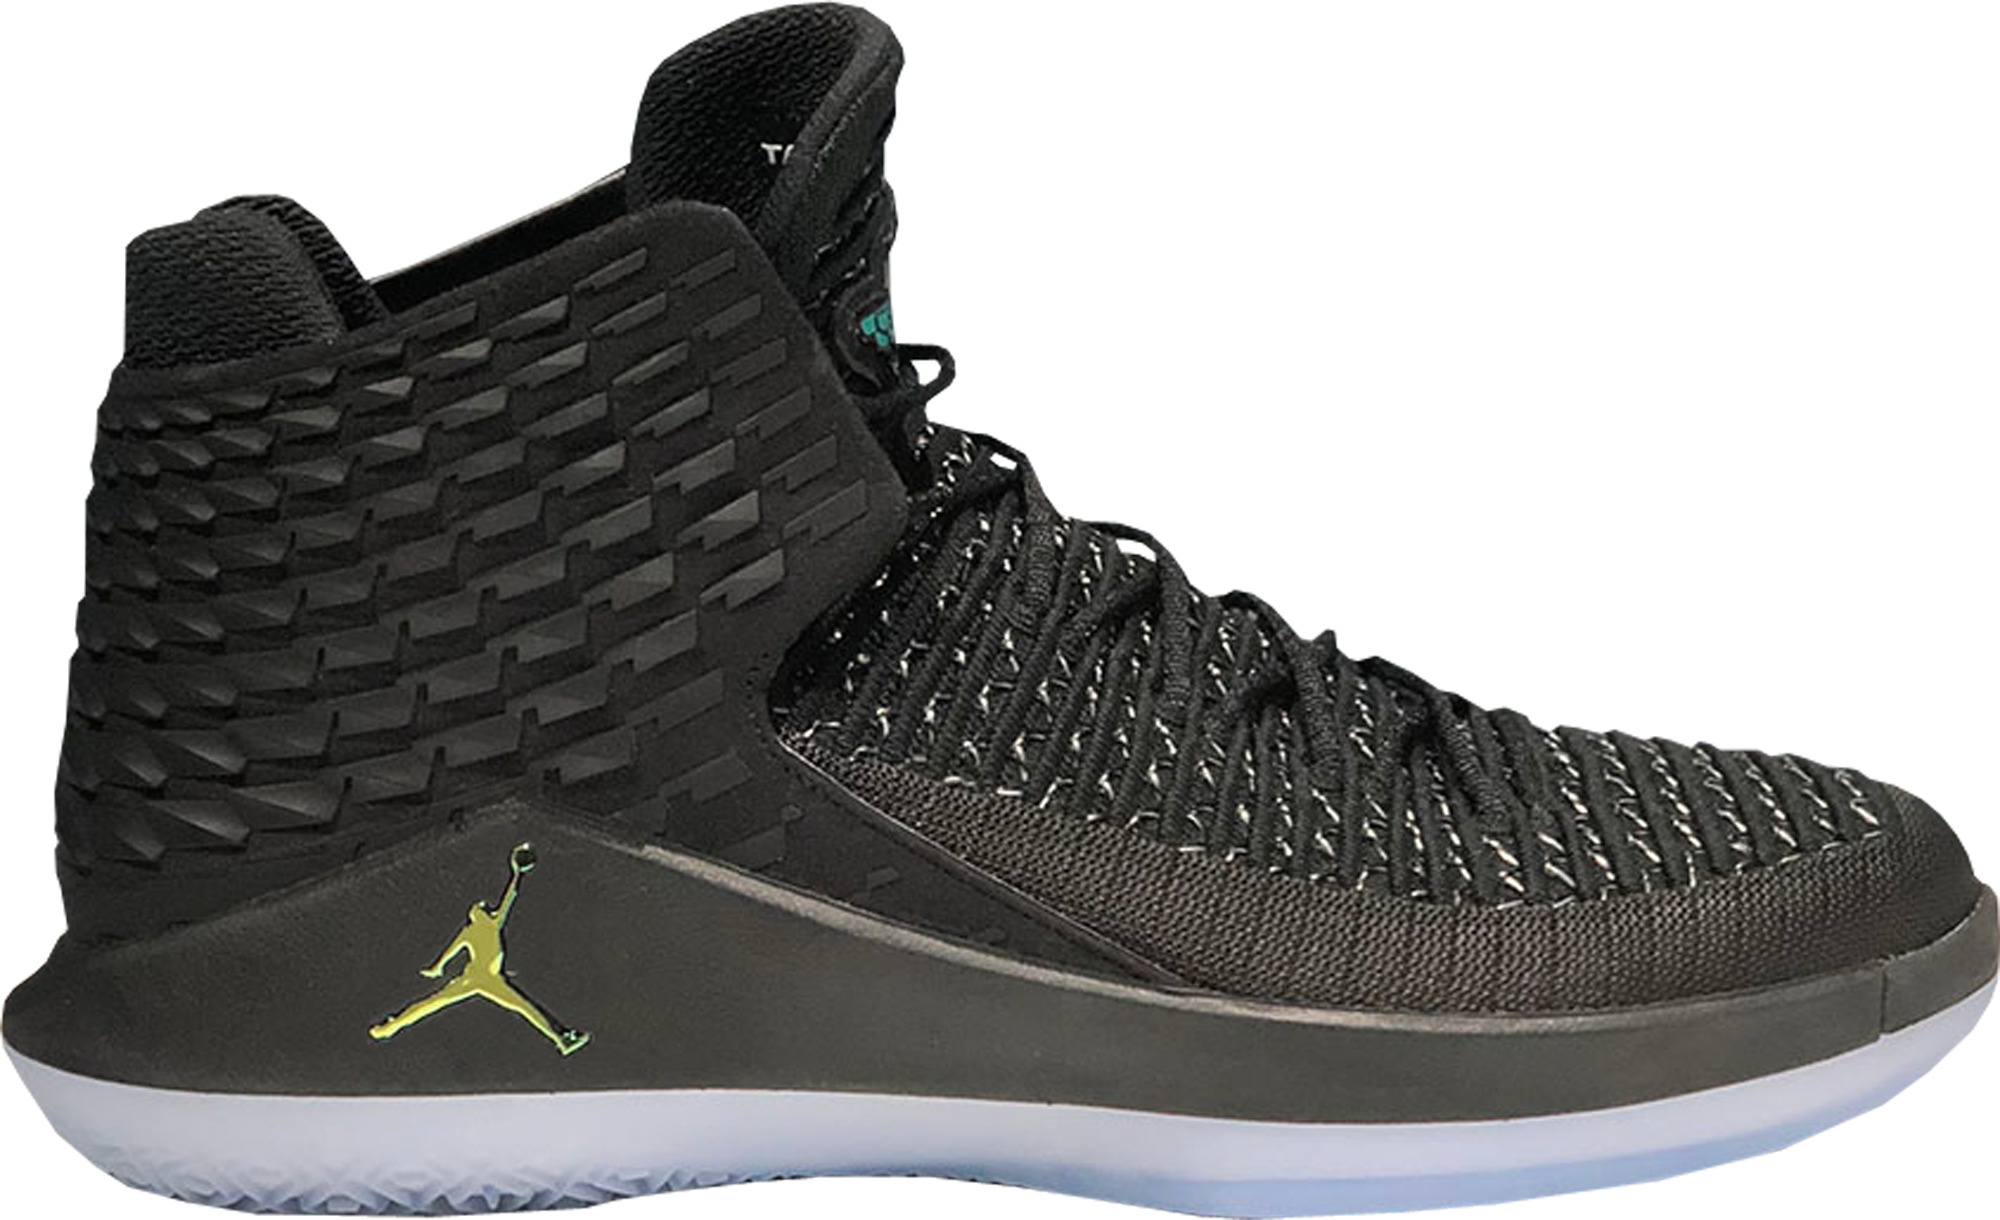 Air Jordan XXXII Black Cat